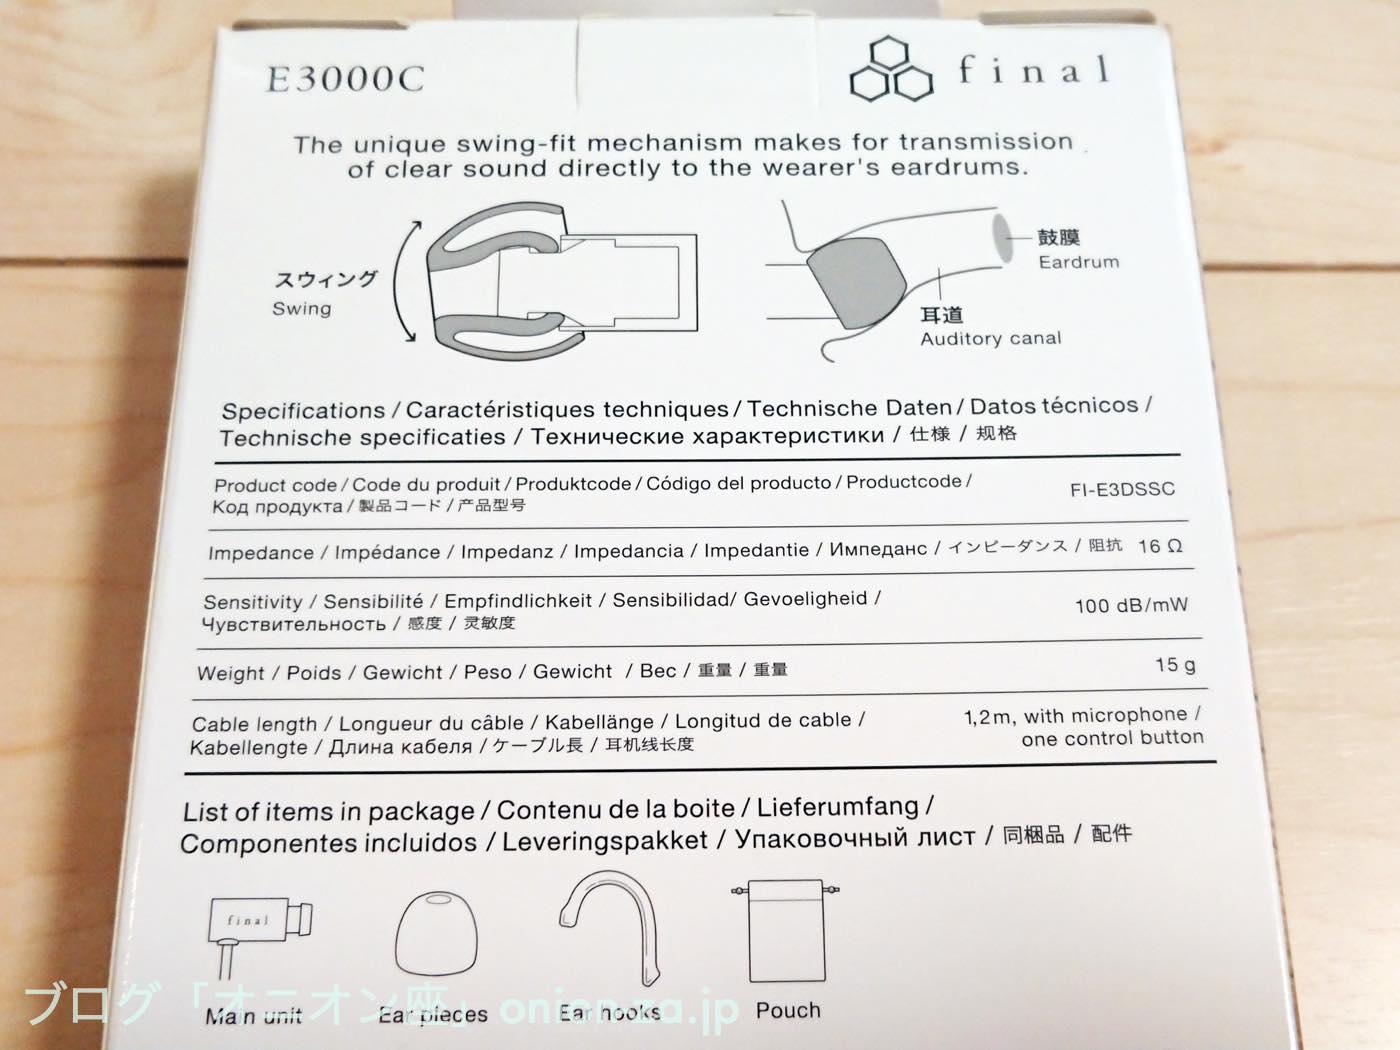 E300Cのパッケージにはスペックが書かれているが周波数特性は明記されていない